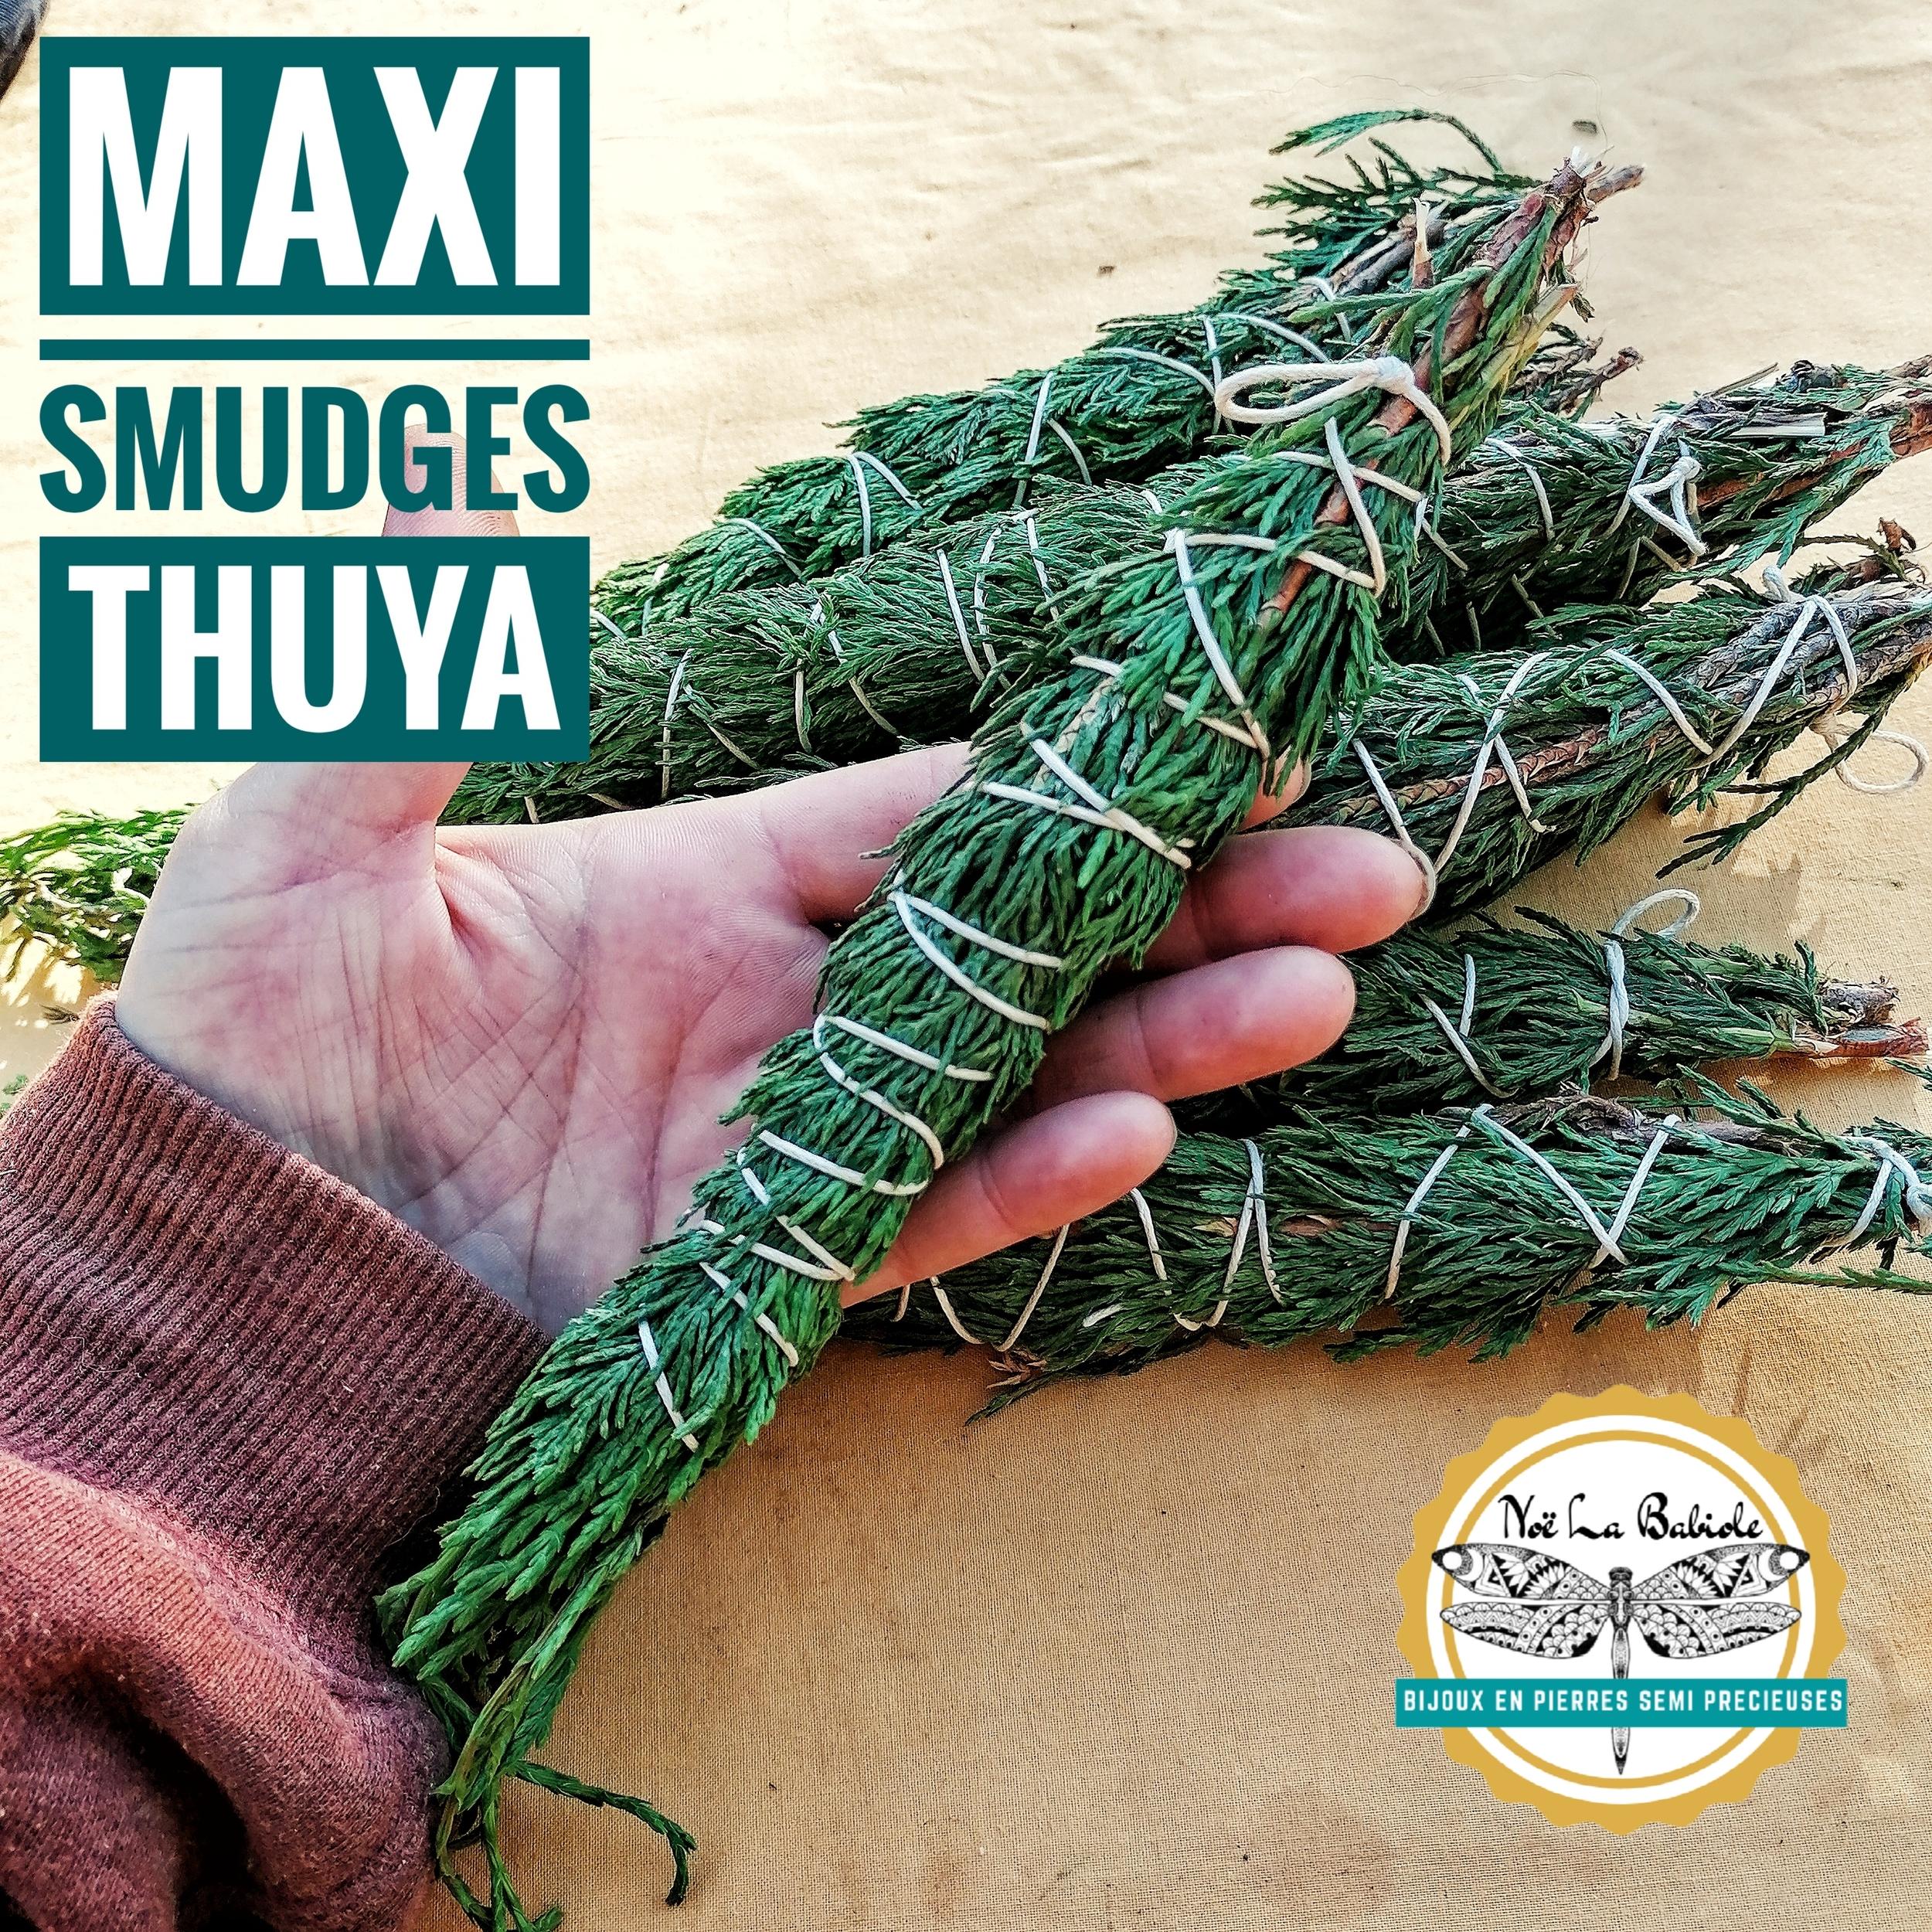 Maxi Smudge Thuya - Purification & Harmonie